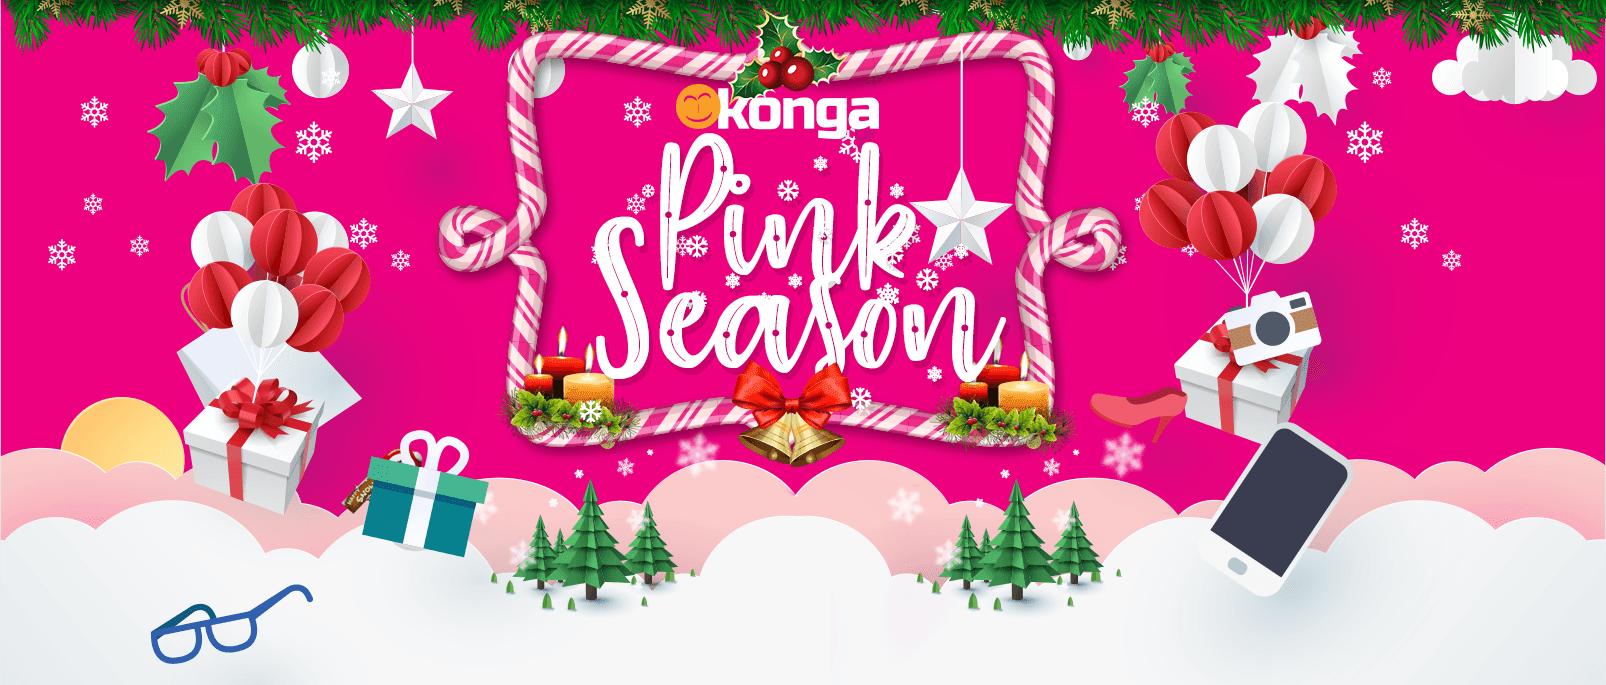 https://www-konga-com-res.cloudinary.com/image/upload/v1544015383/landingPages/pinkSeason/pinkXmas_02.png